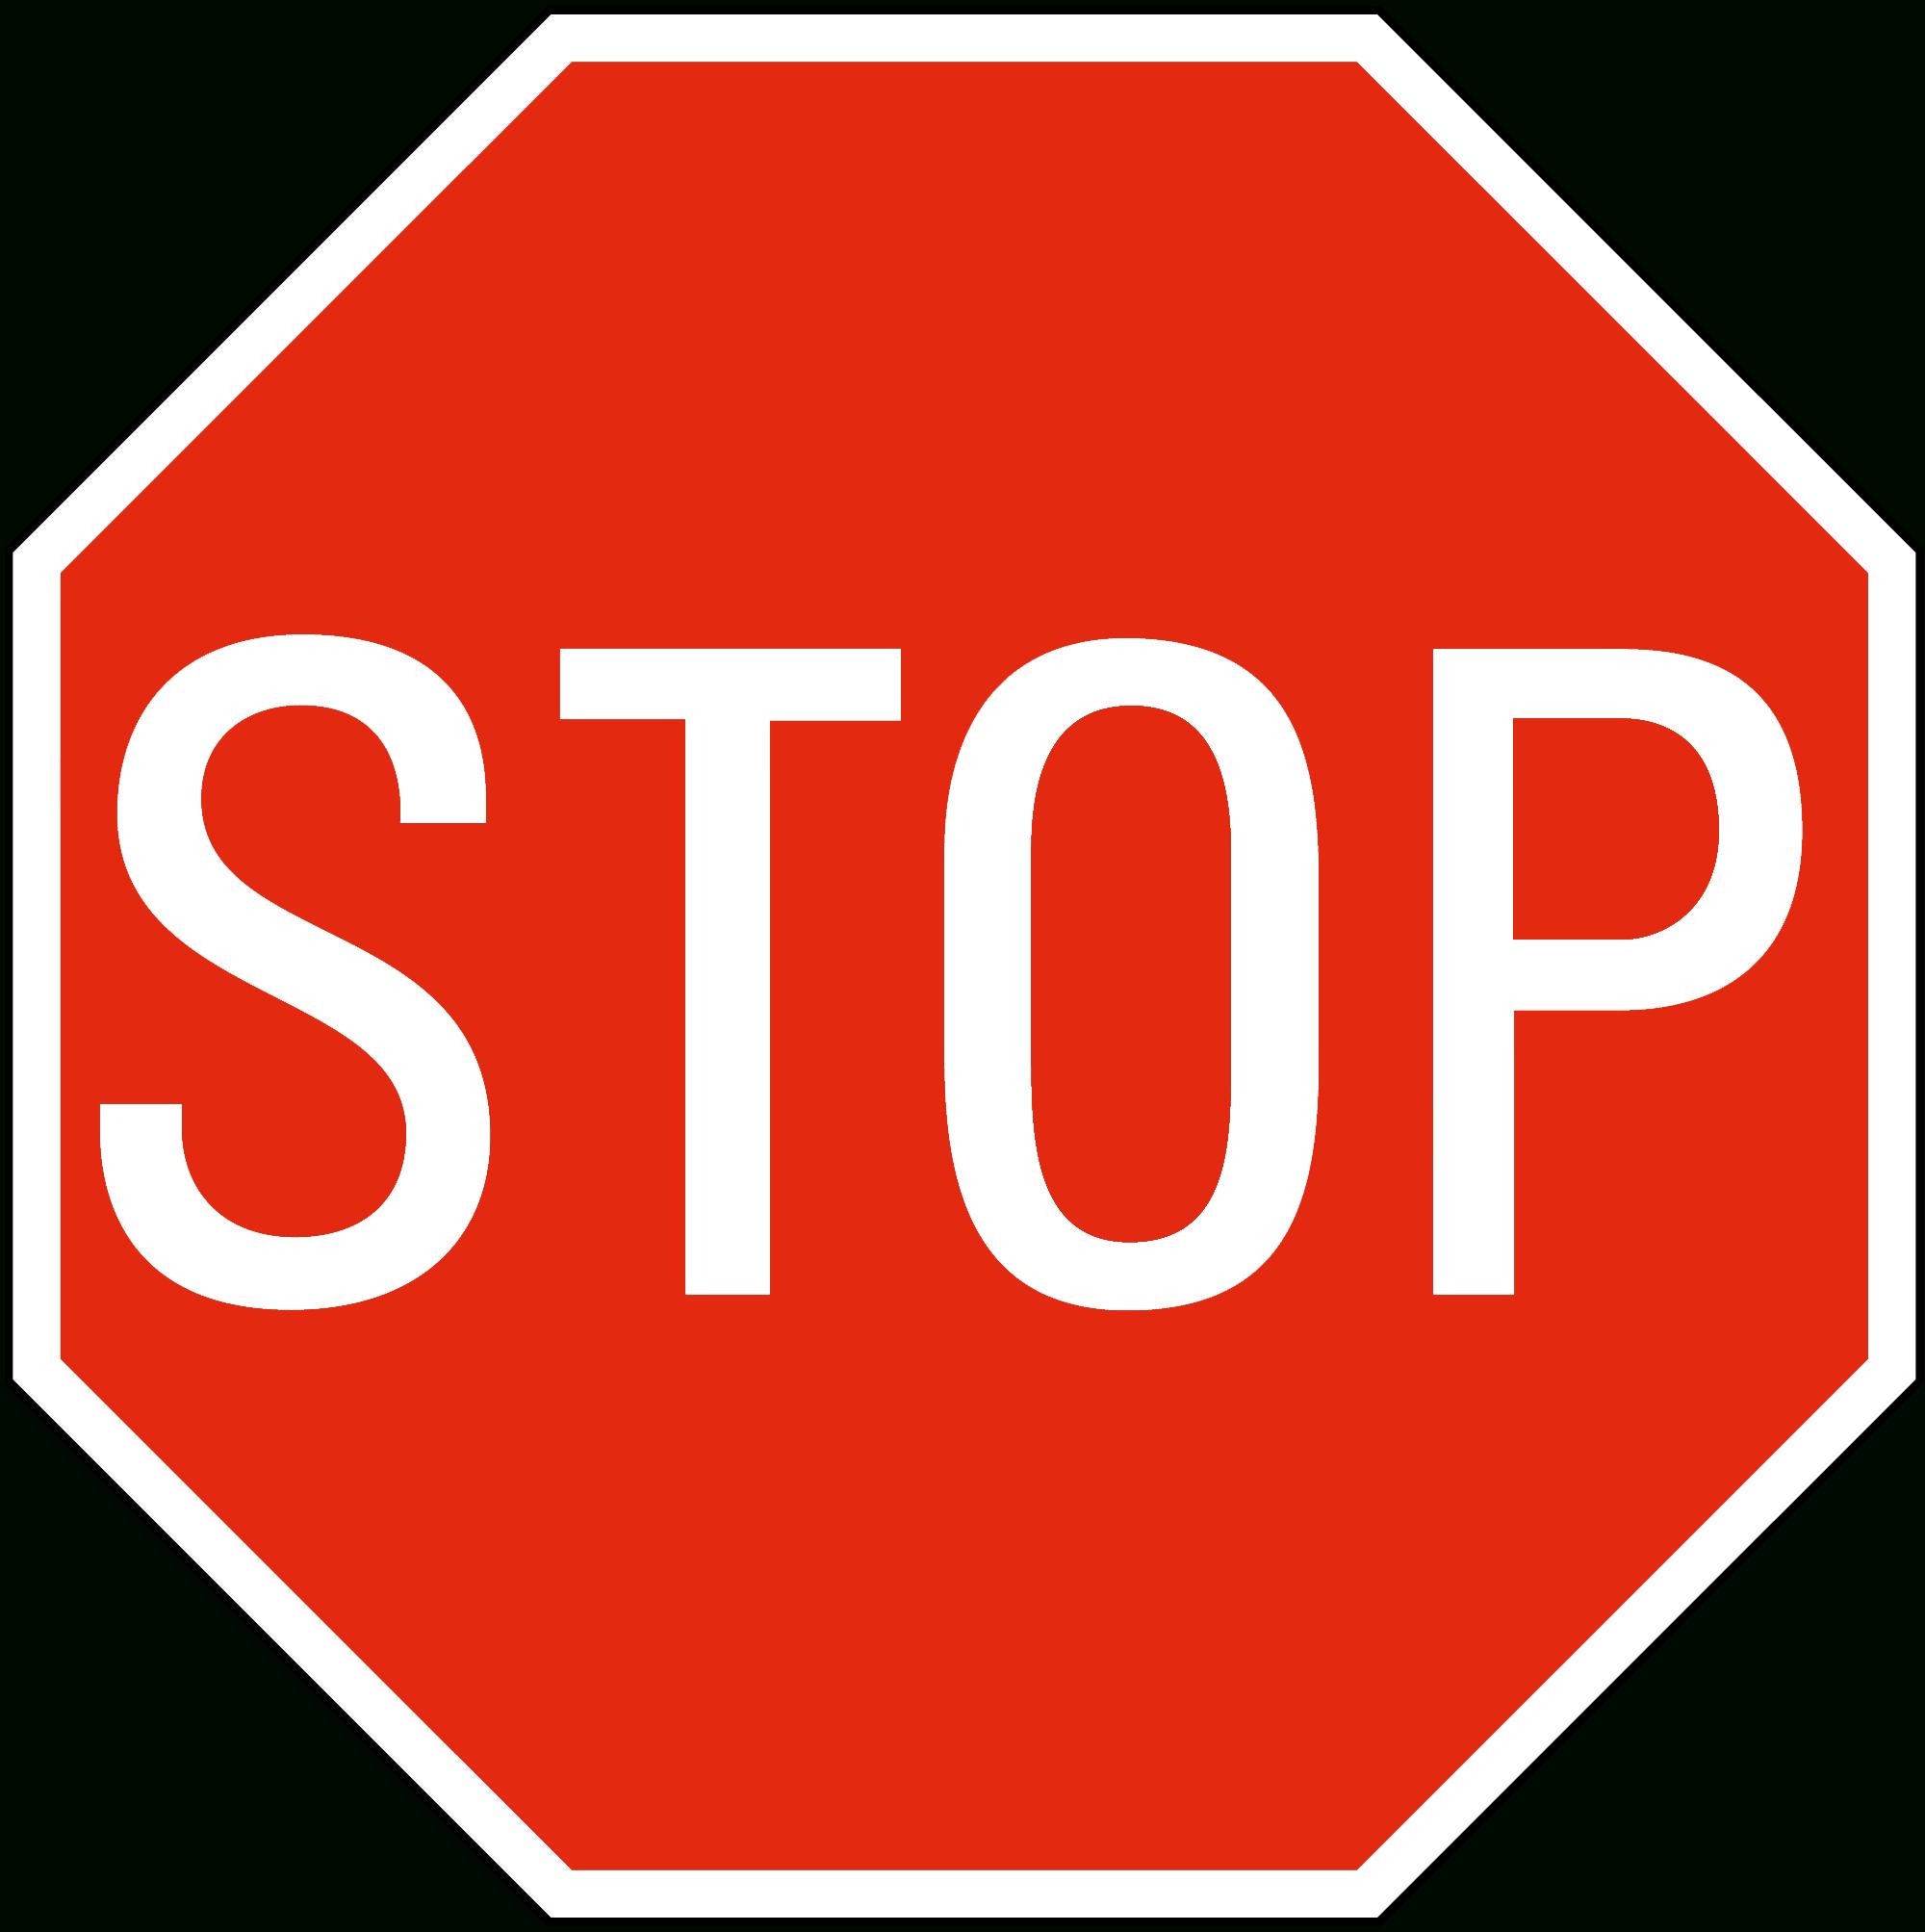 Free Free Printable Stop Sign, Download Free Clip Art, Free Clip Art - Free Printable No Entry Sign